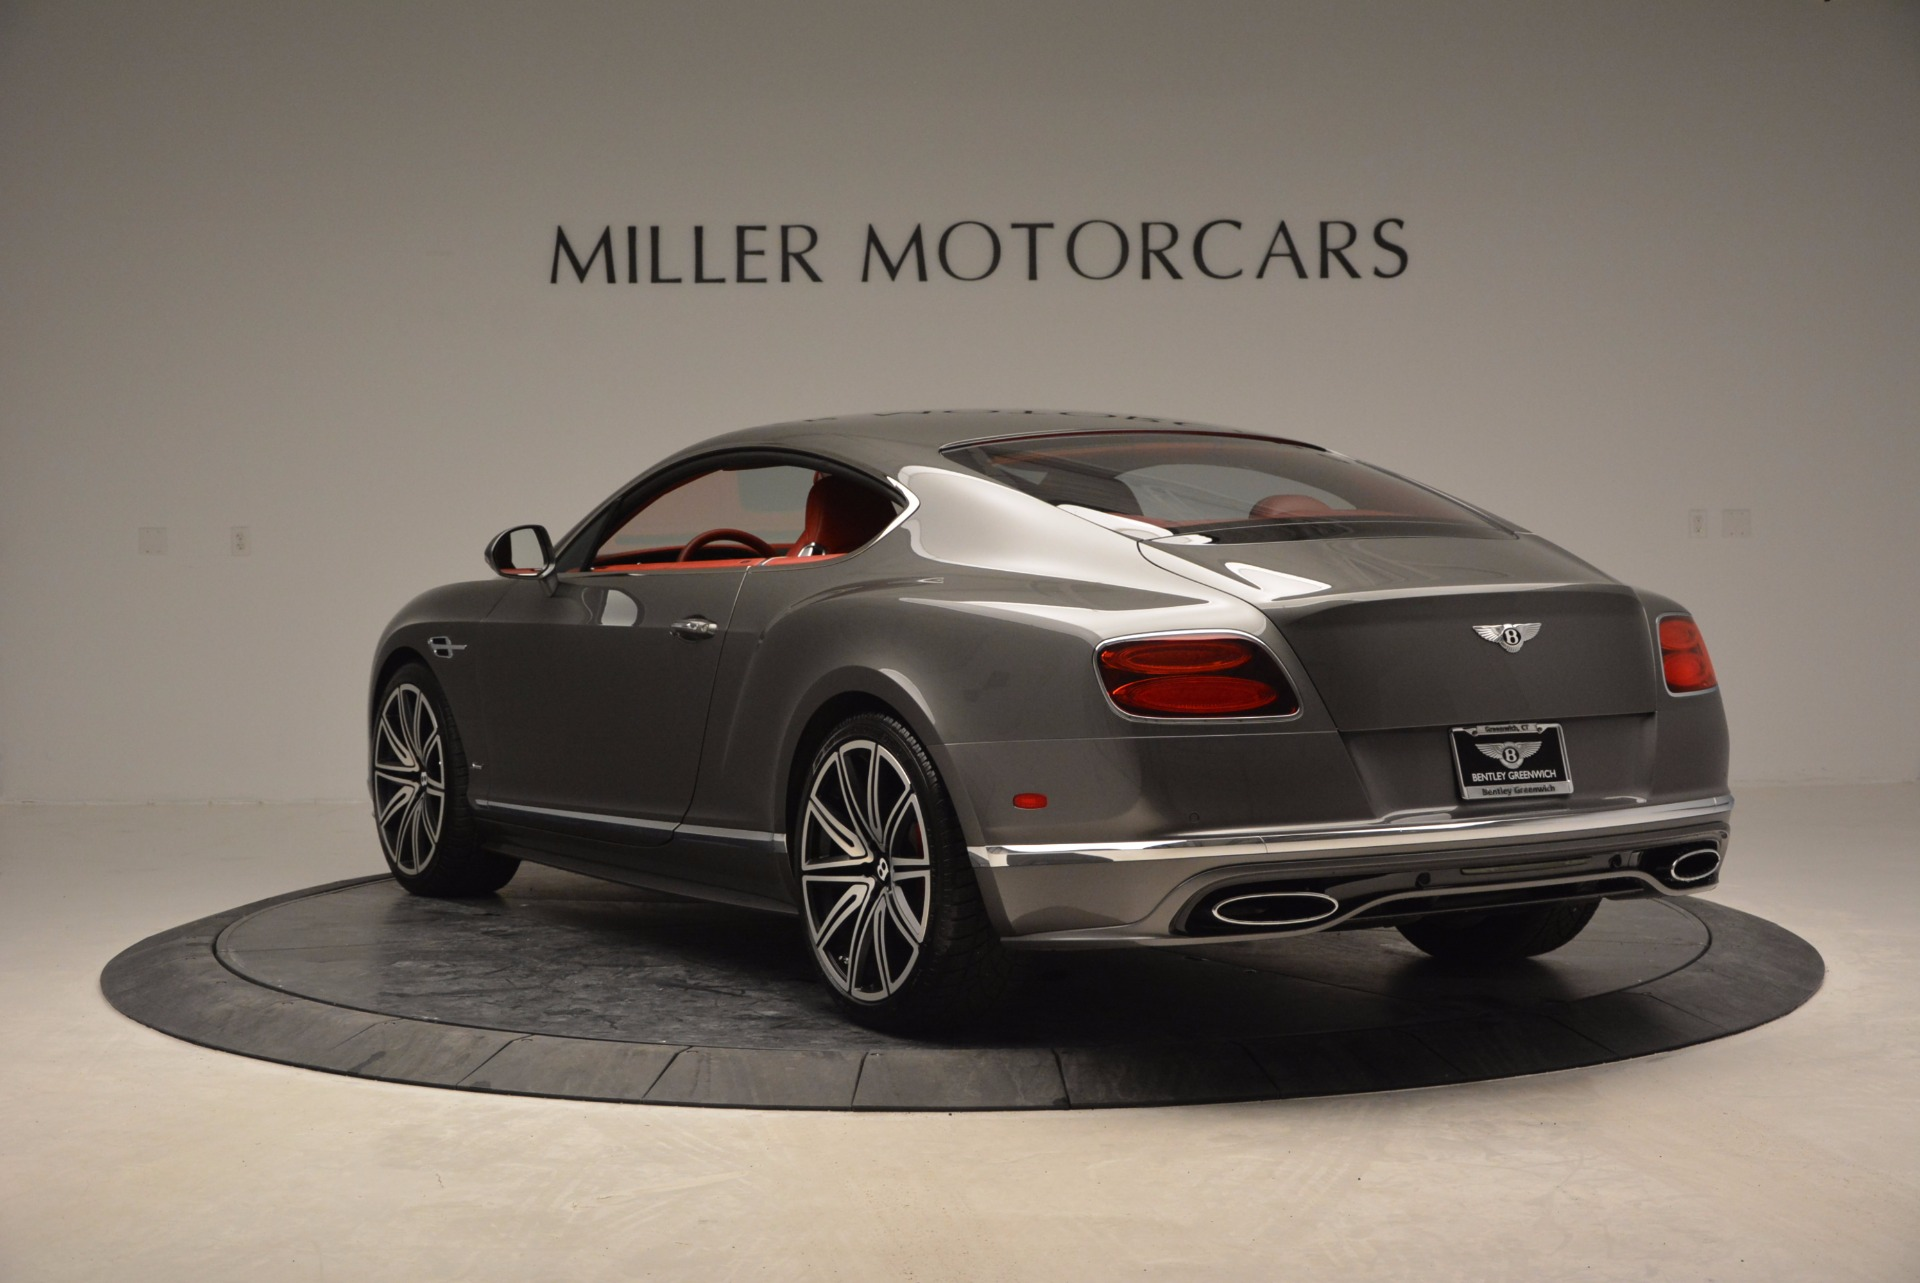 Used 2016 Bentley Continental GT Speed For Sale In Westport, CT 910_p5